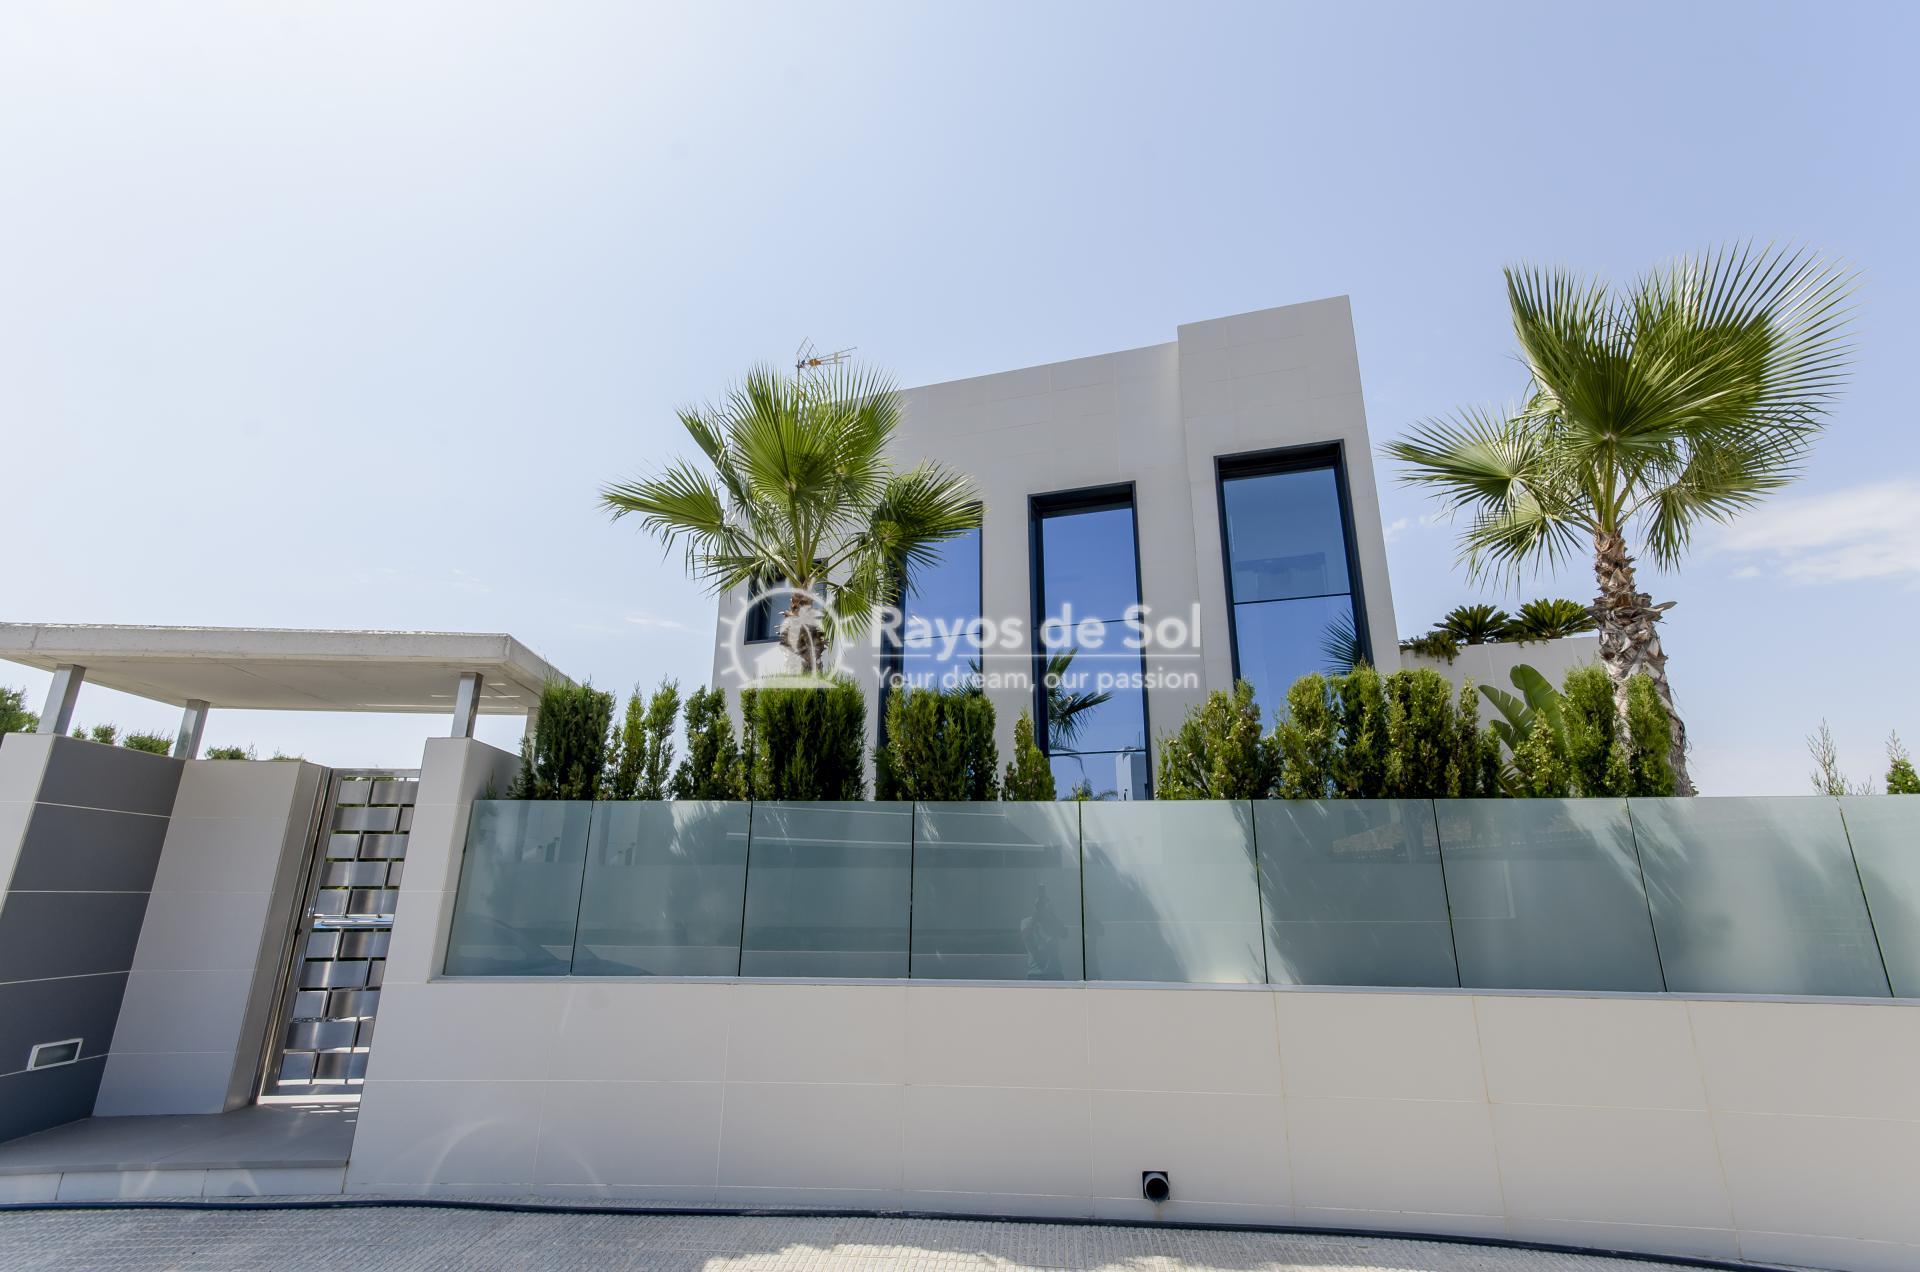 Villa  in Campoamor, Orihuela Costa, Costa Blanca (adeluxe-penelope) - 52